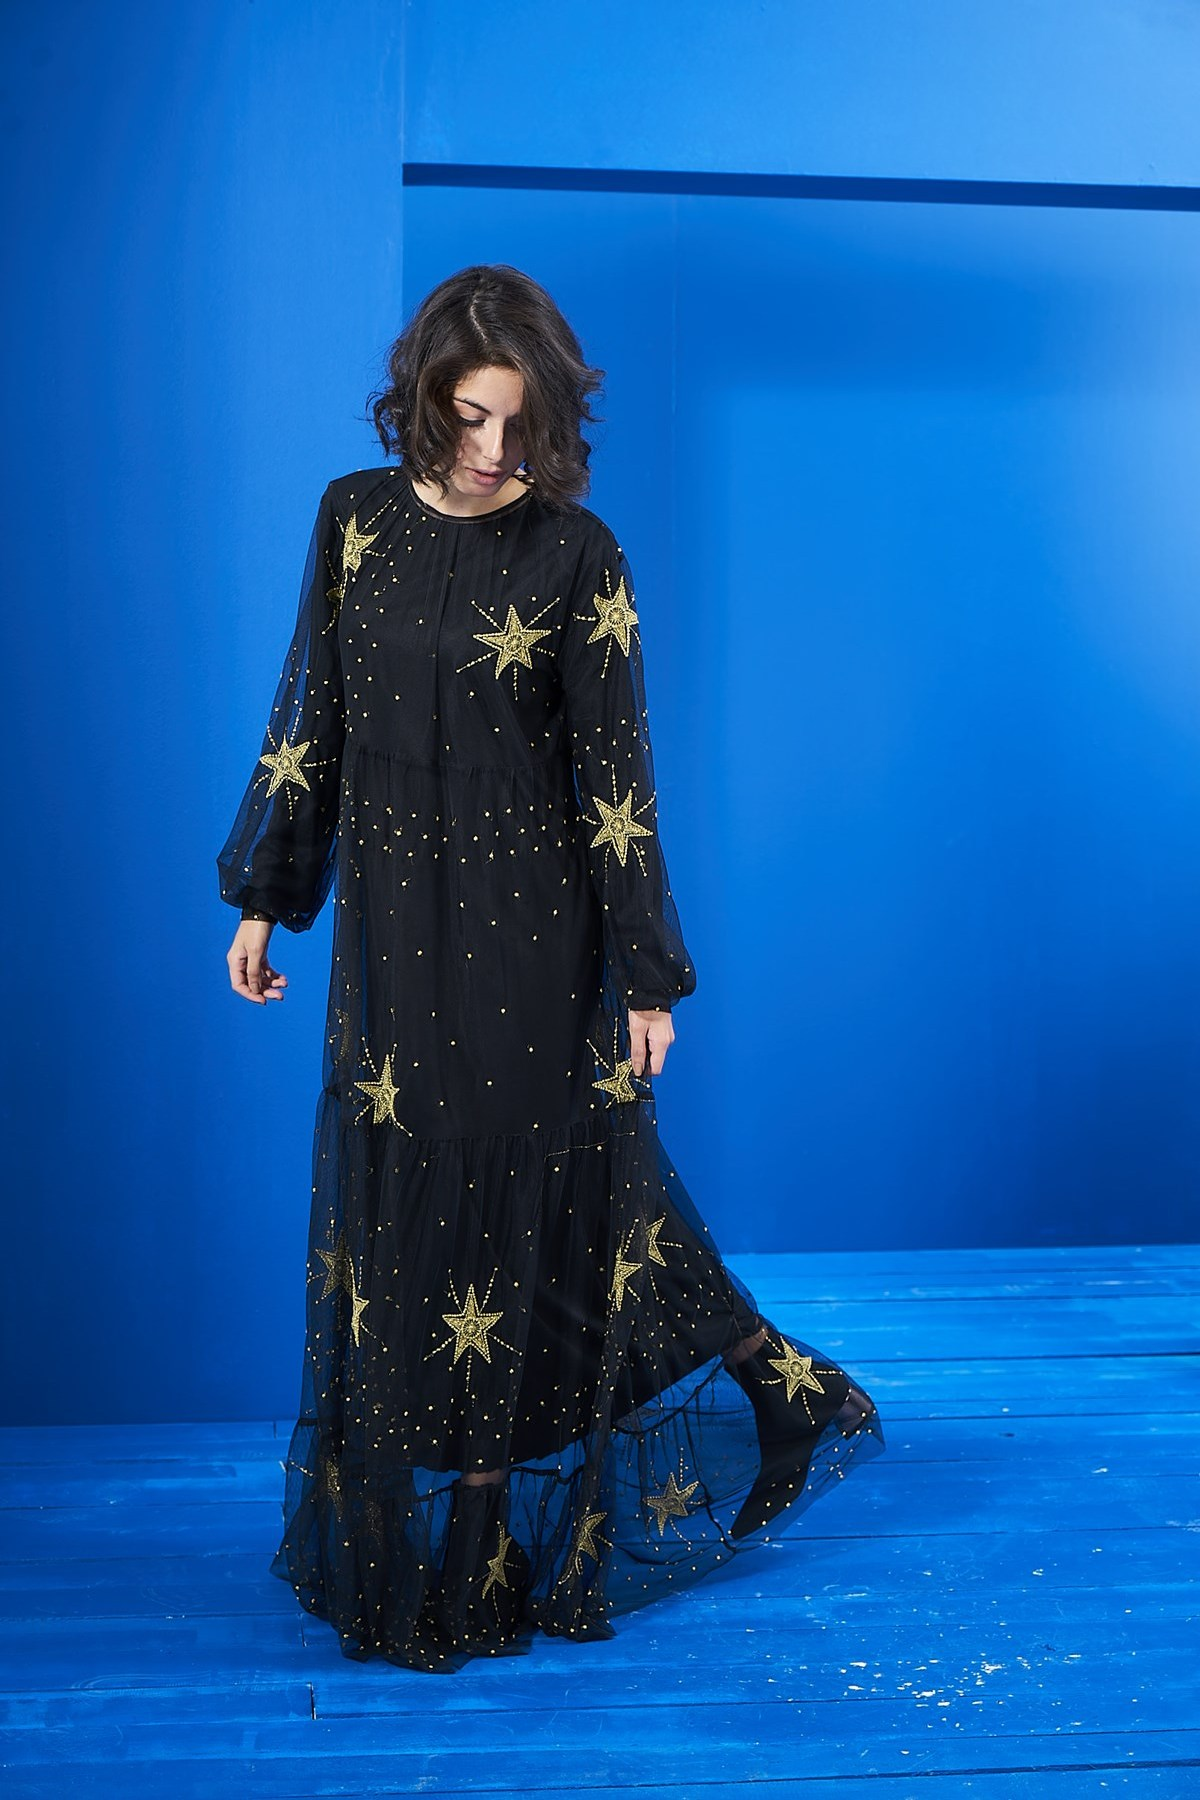 Mevra - Siyah Nakış Detaylı Tül Elbise